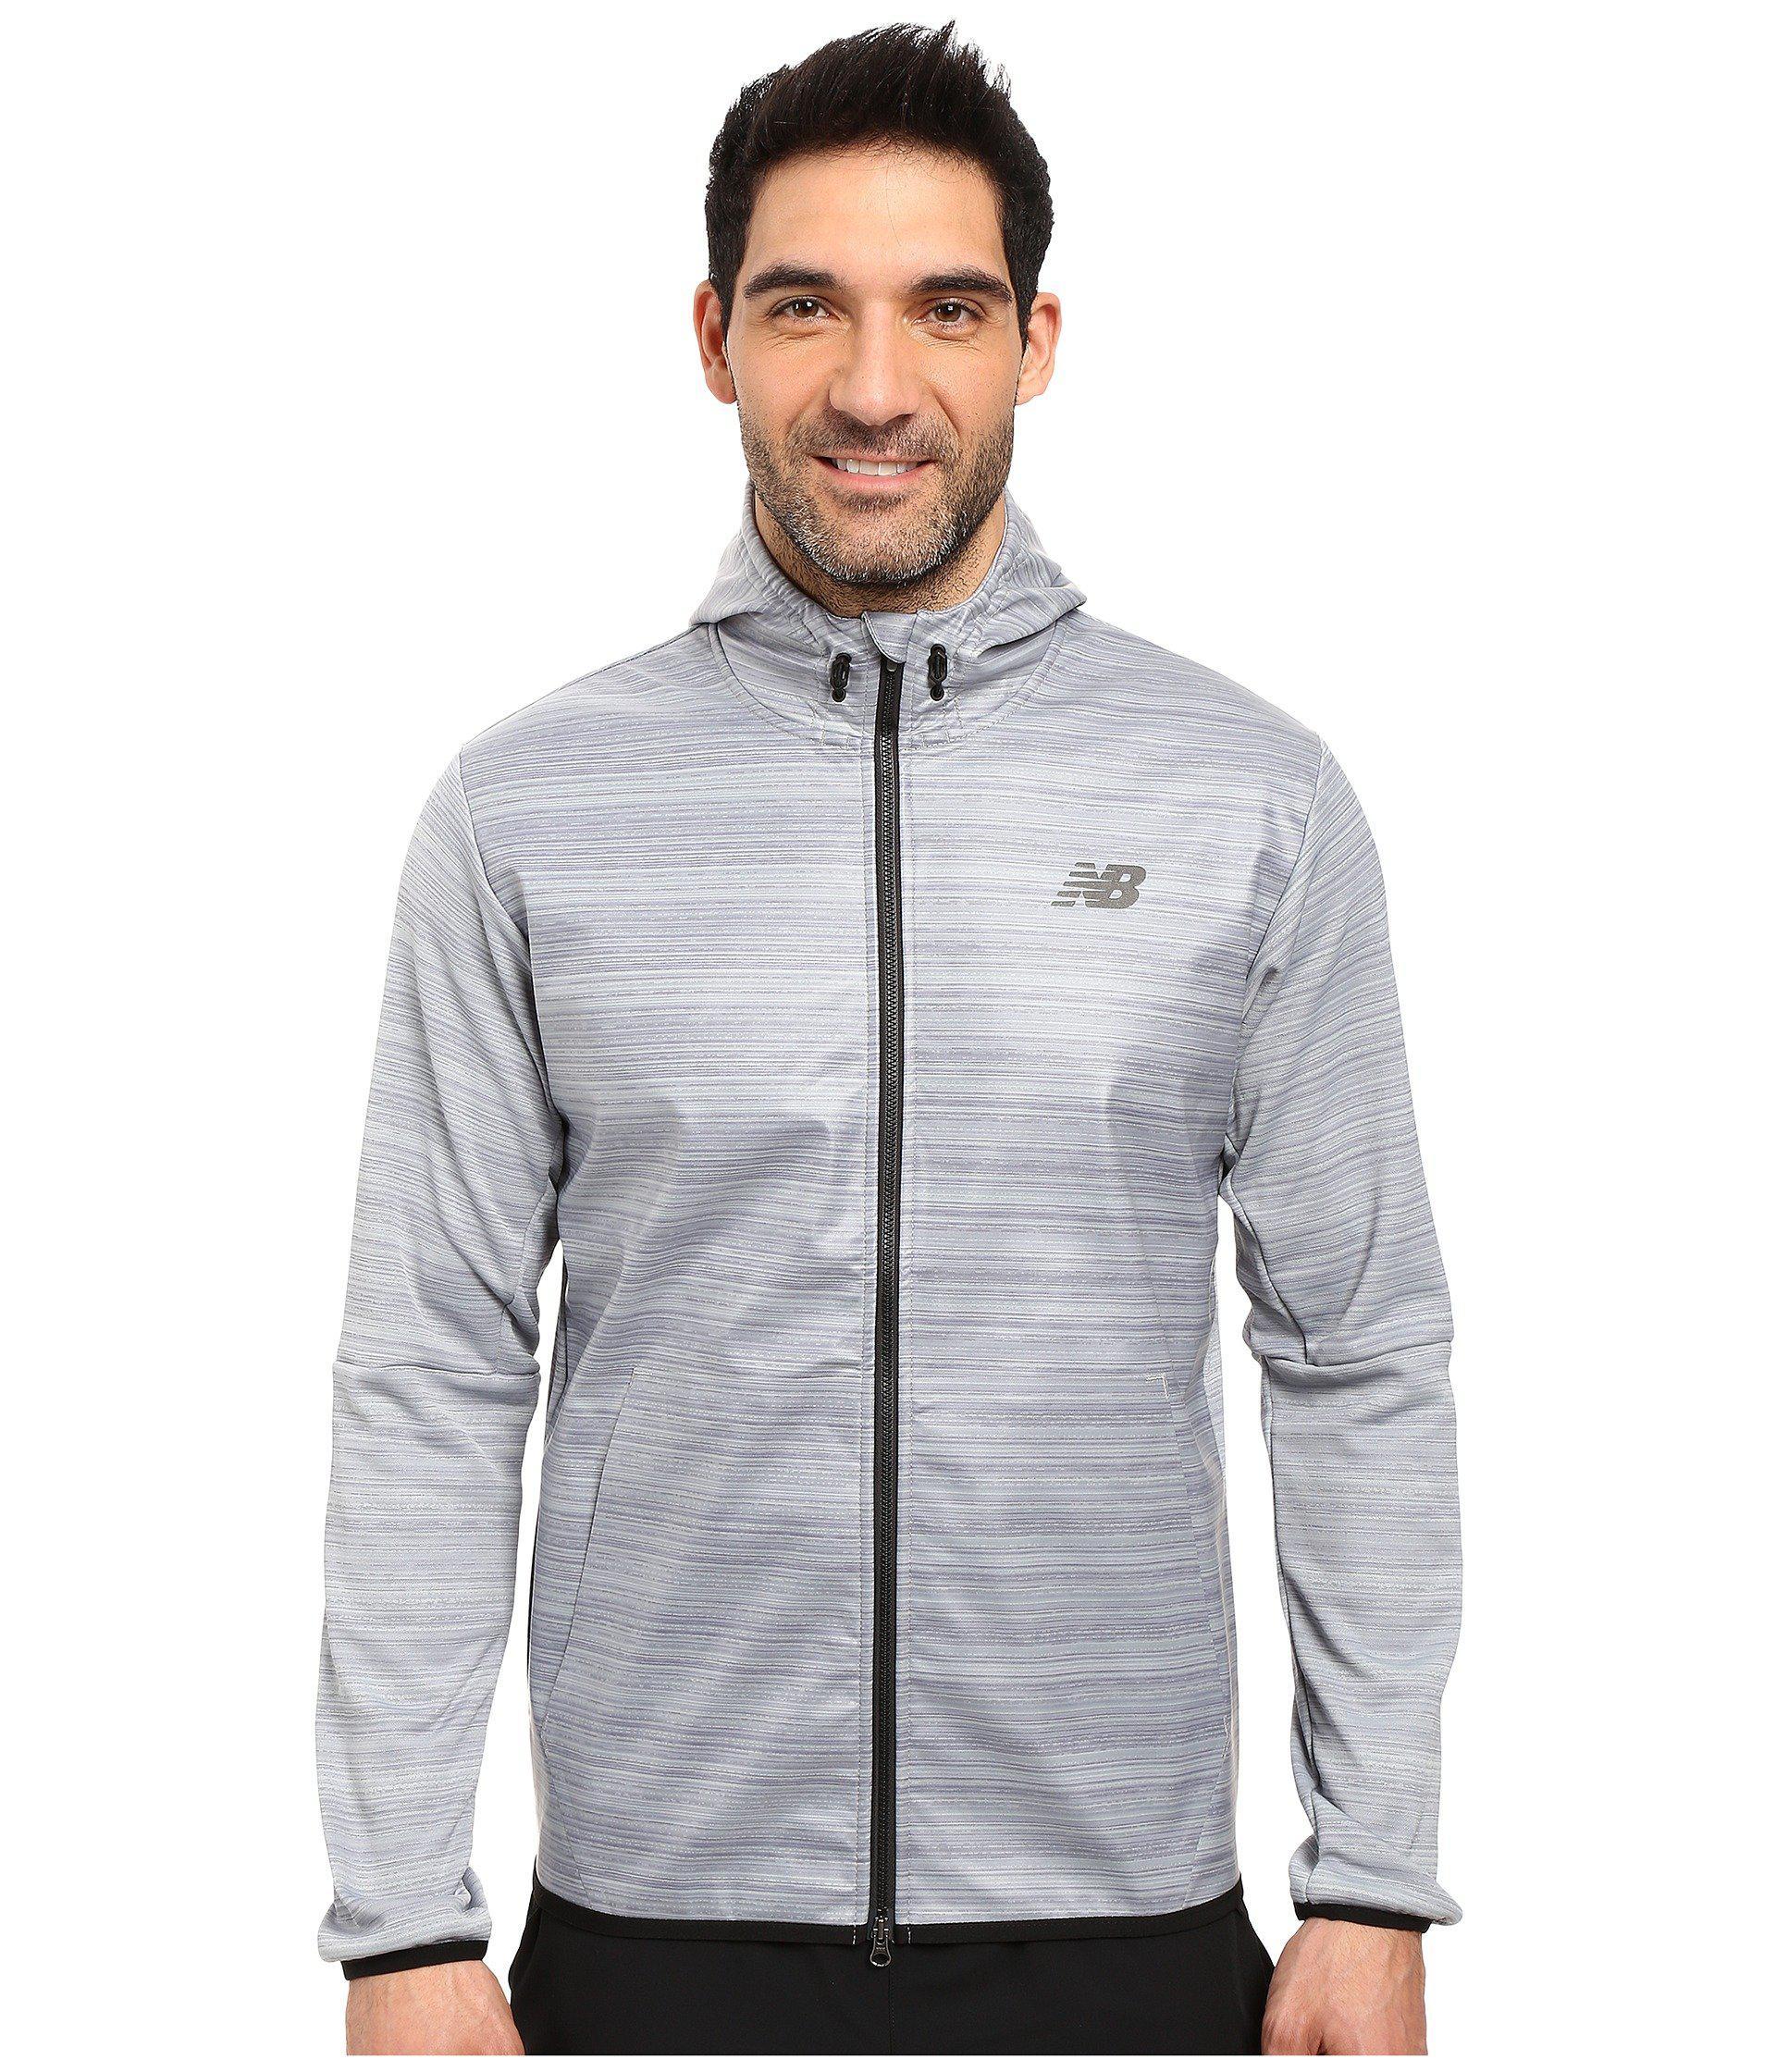 55fa501402833 New Balance Kairosport Jacket in Gray for Men - Lyst